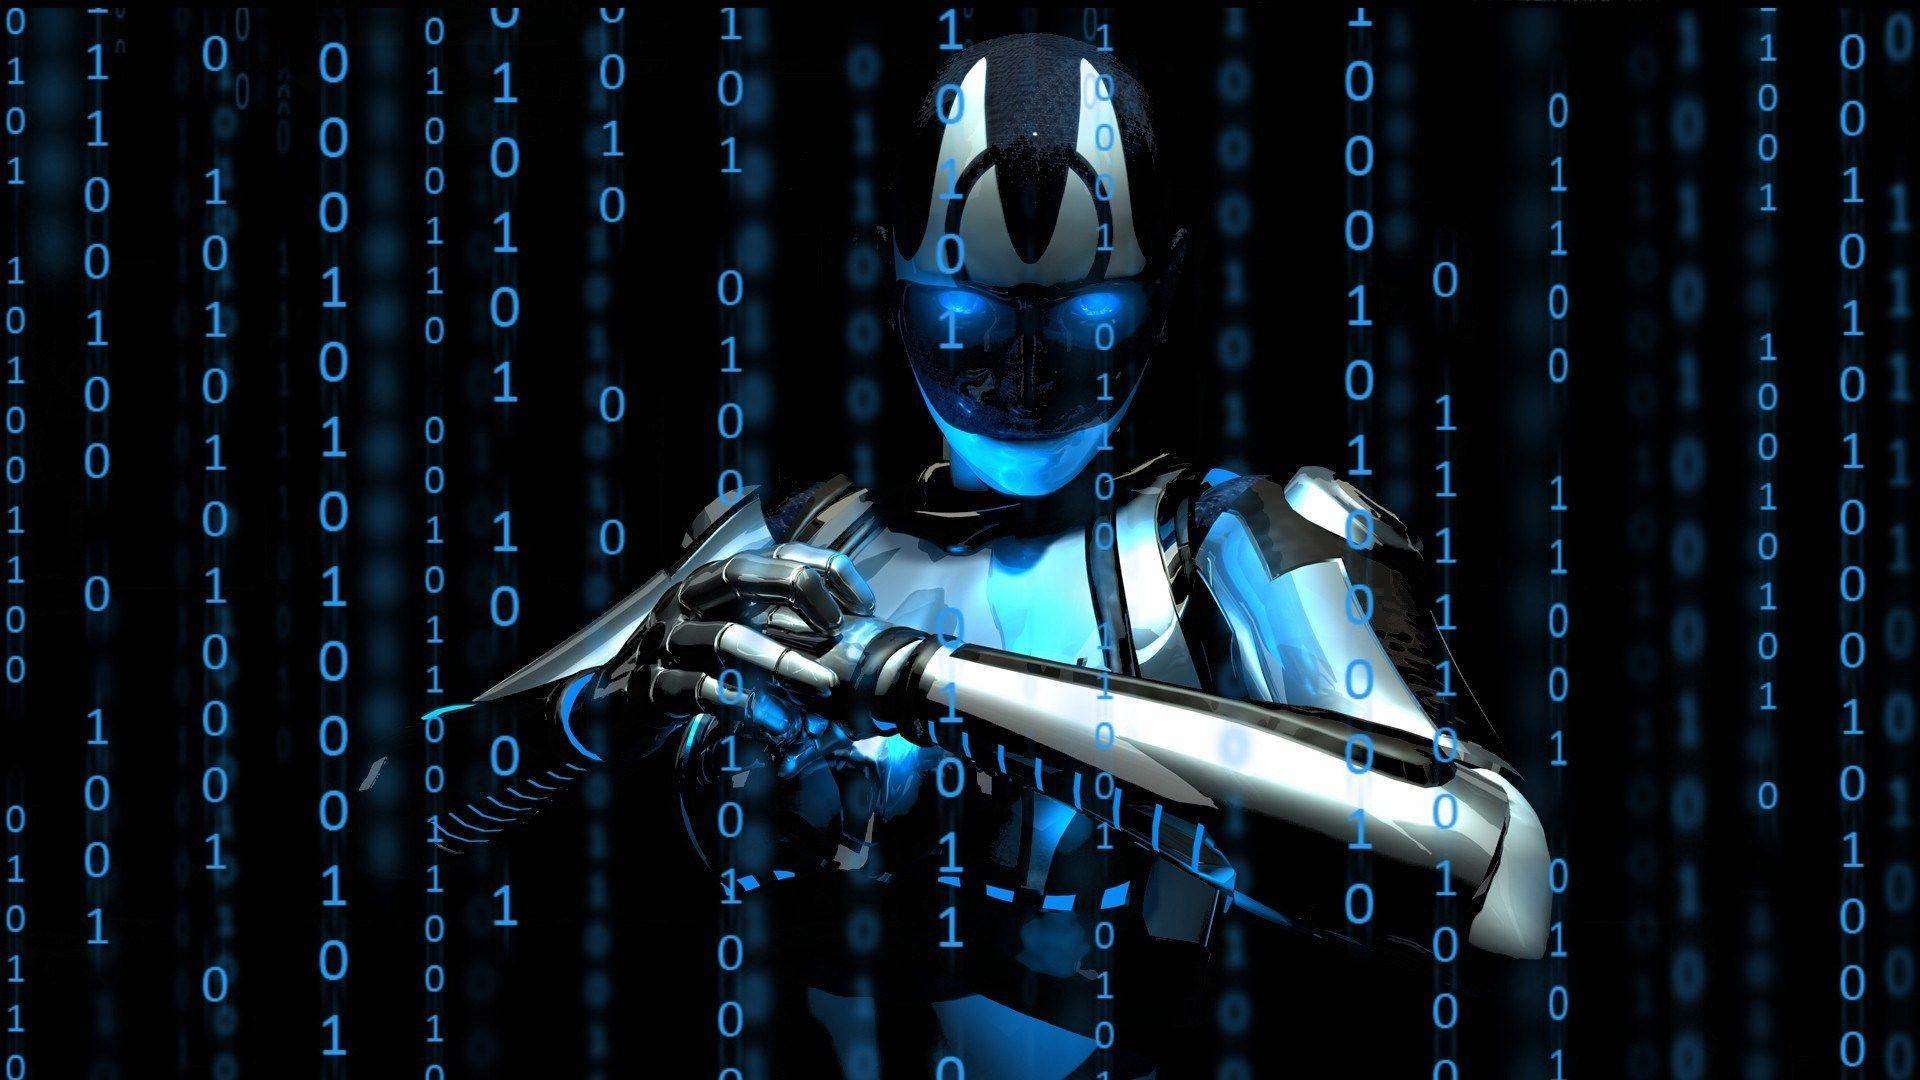 Computer Science Hd Photo Robot Wallpaper Computer Wallpaper Hd Cyborg